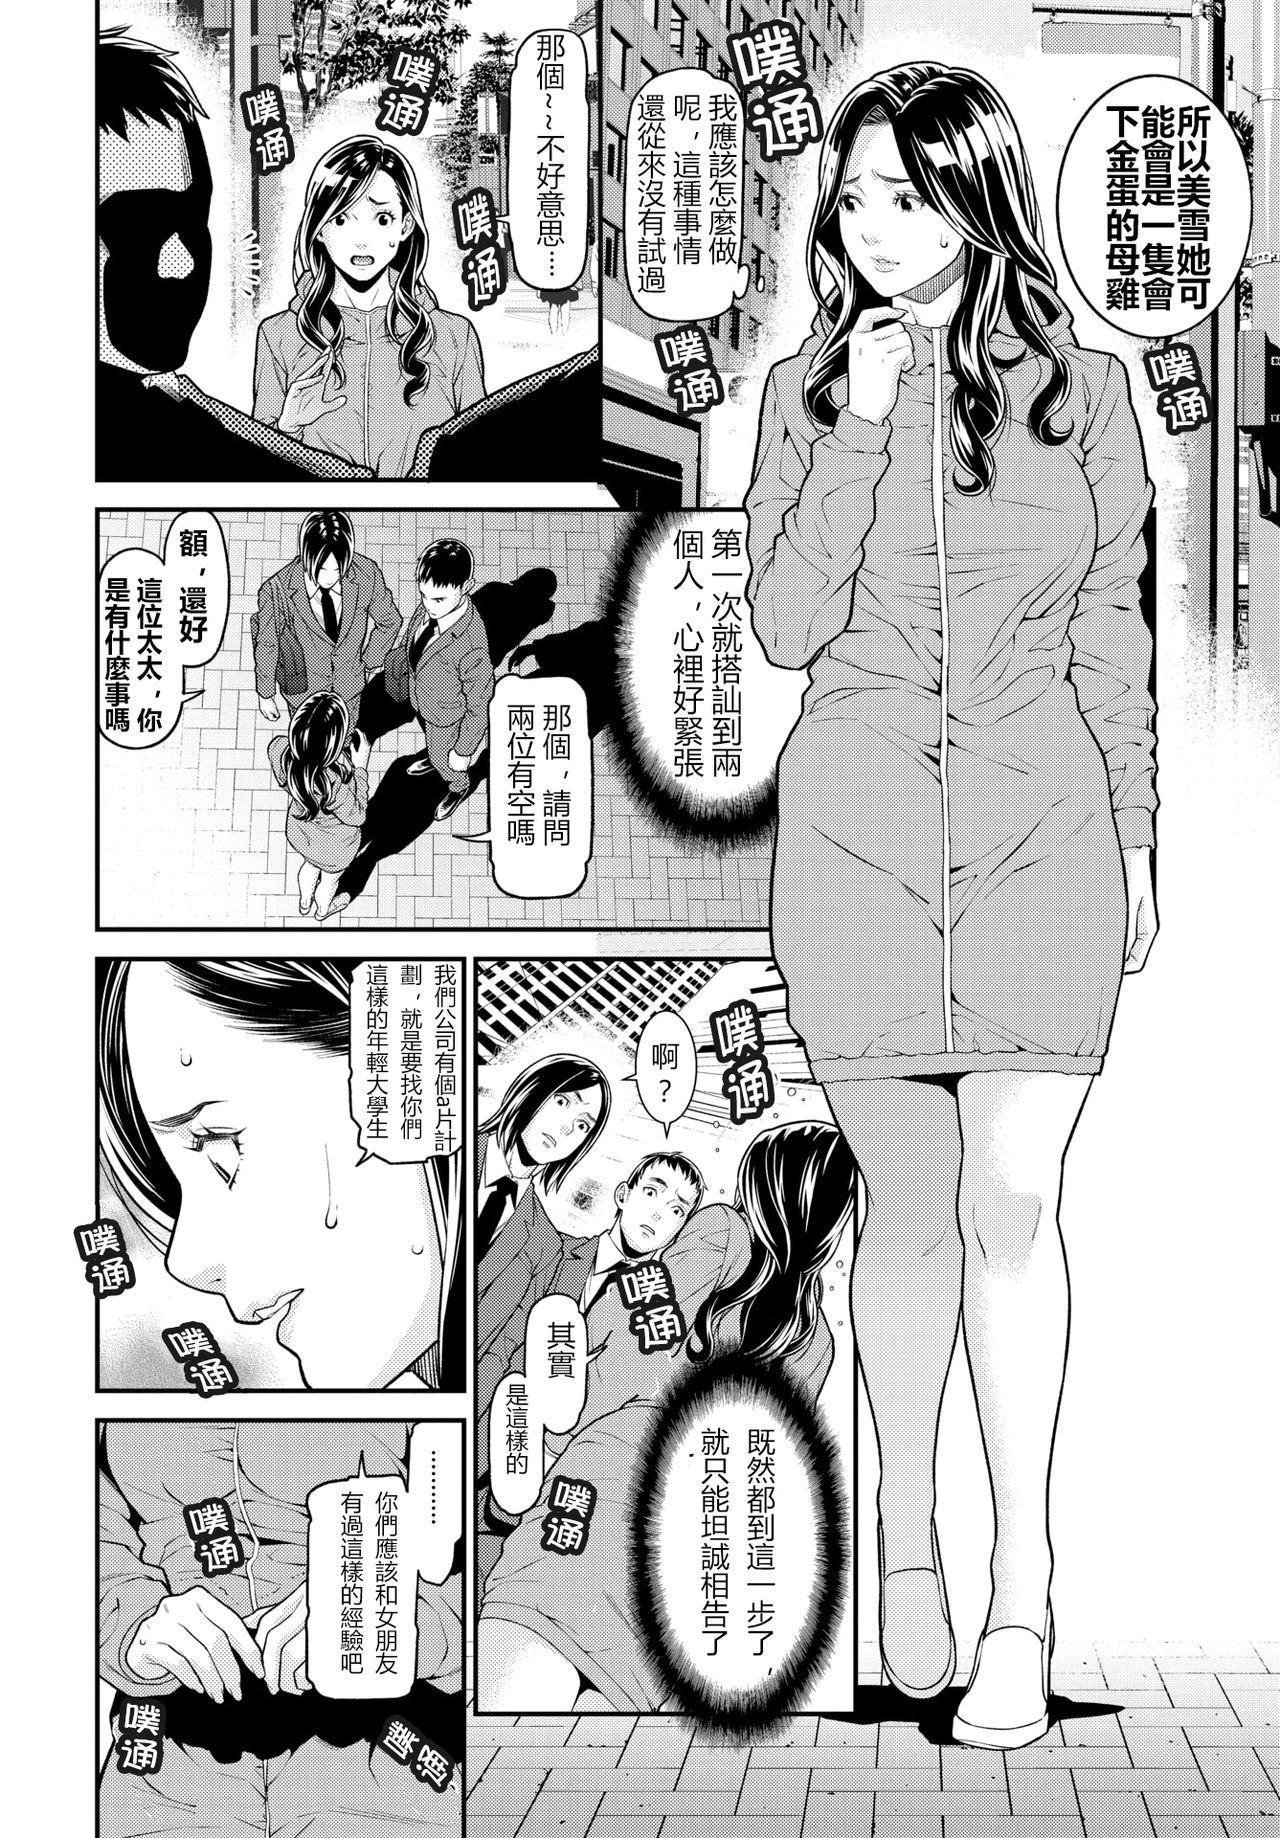 [Syuuen] Secret Wife  1-6 [Chinese][鼠灣漢化](210206最新修复完整版)【極品人妻NTR】 24